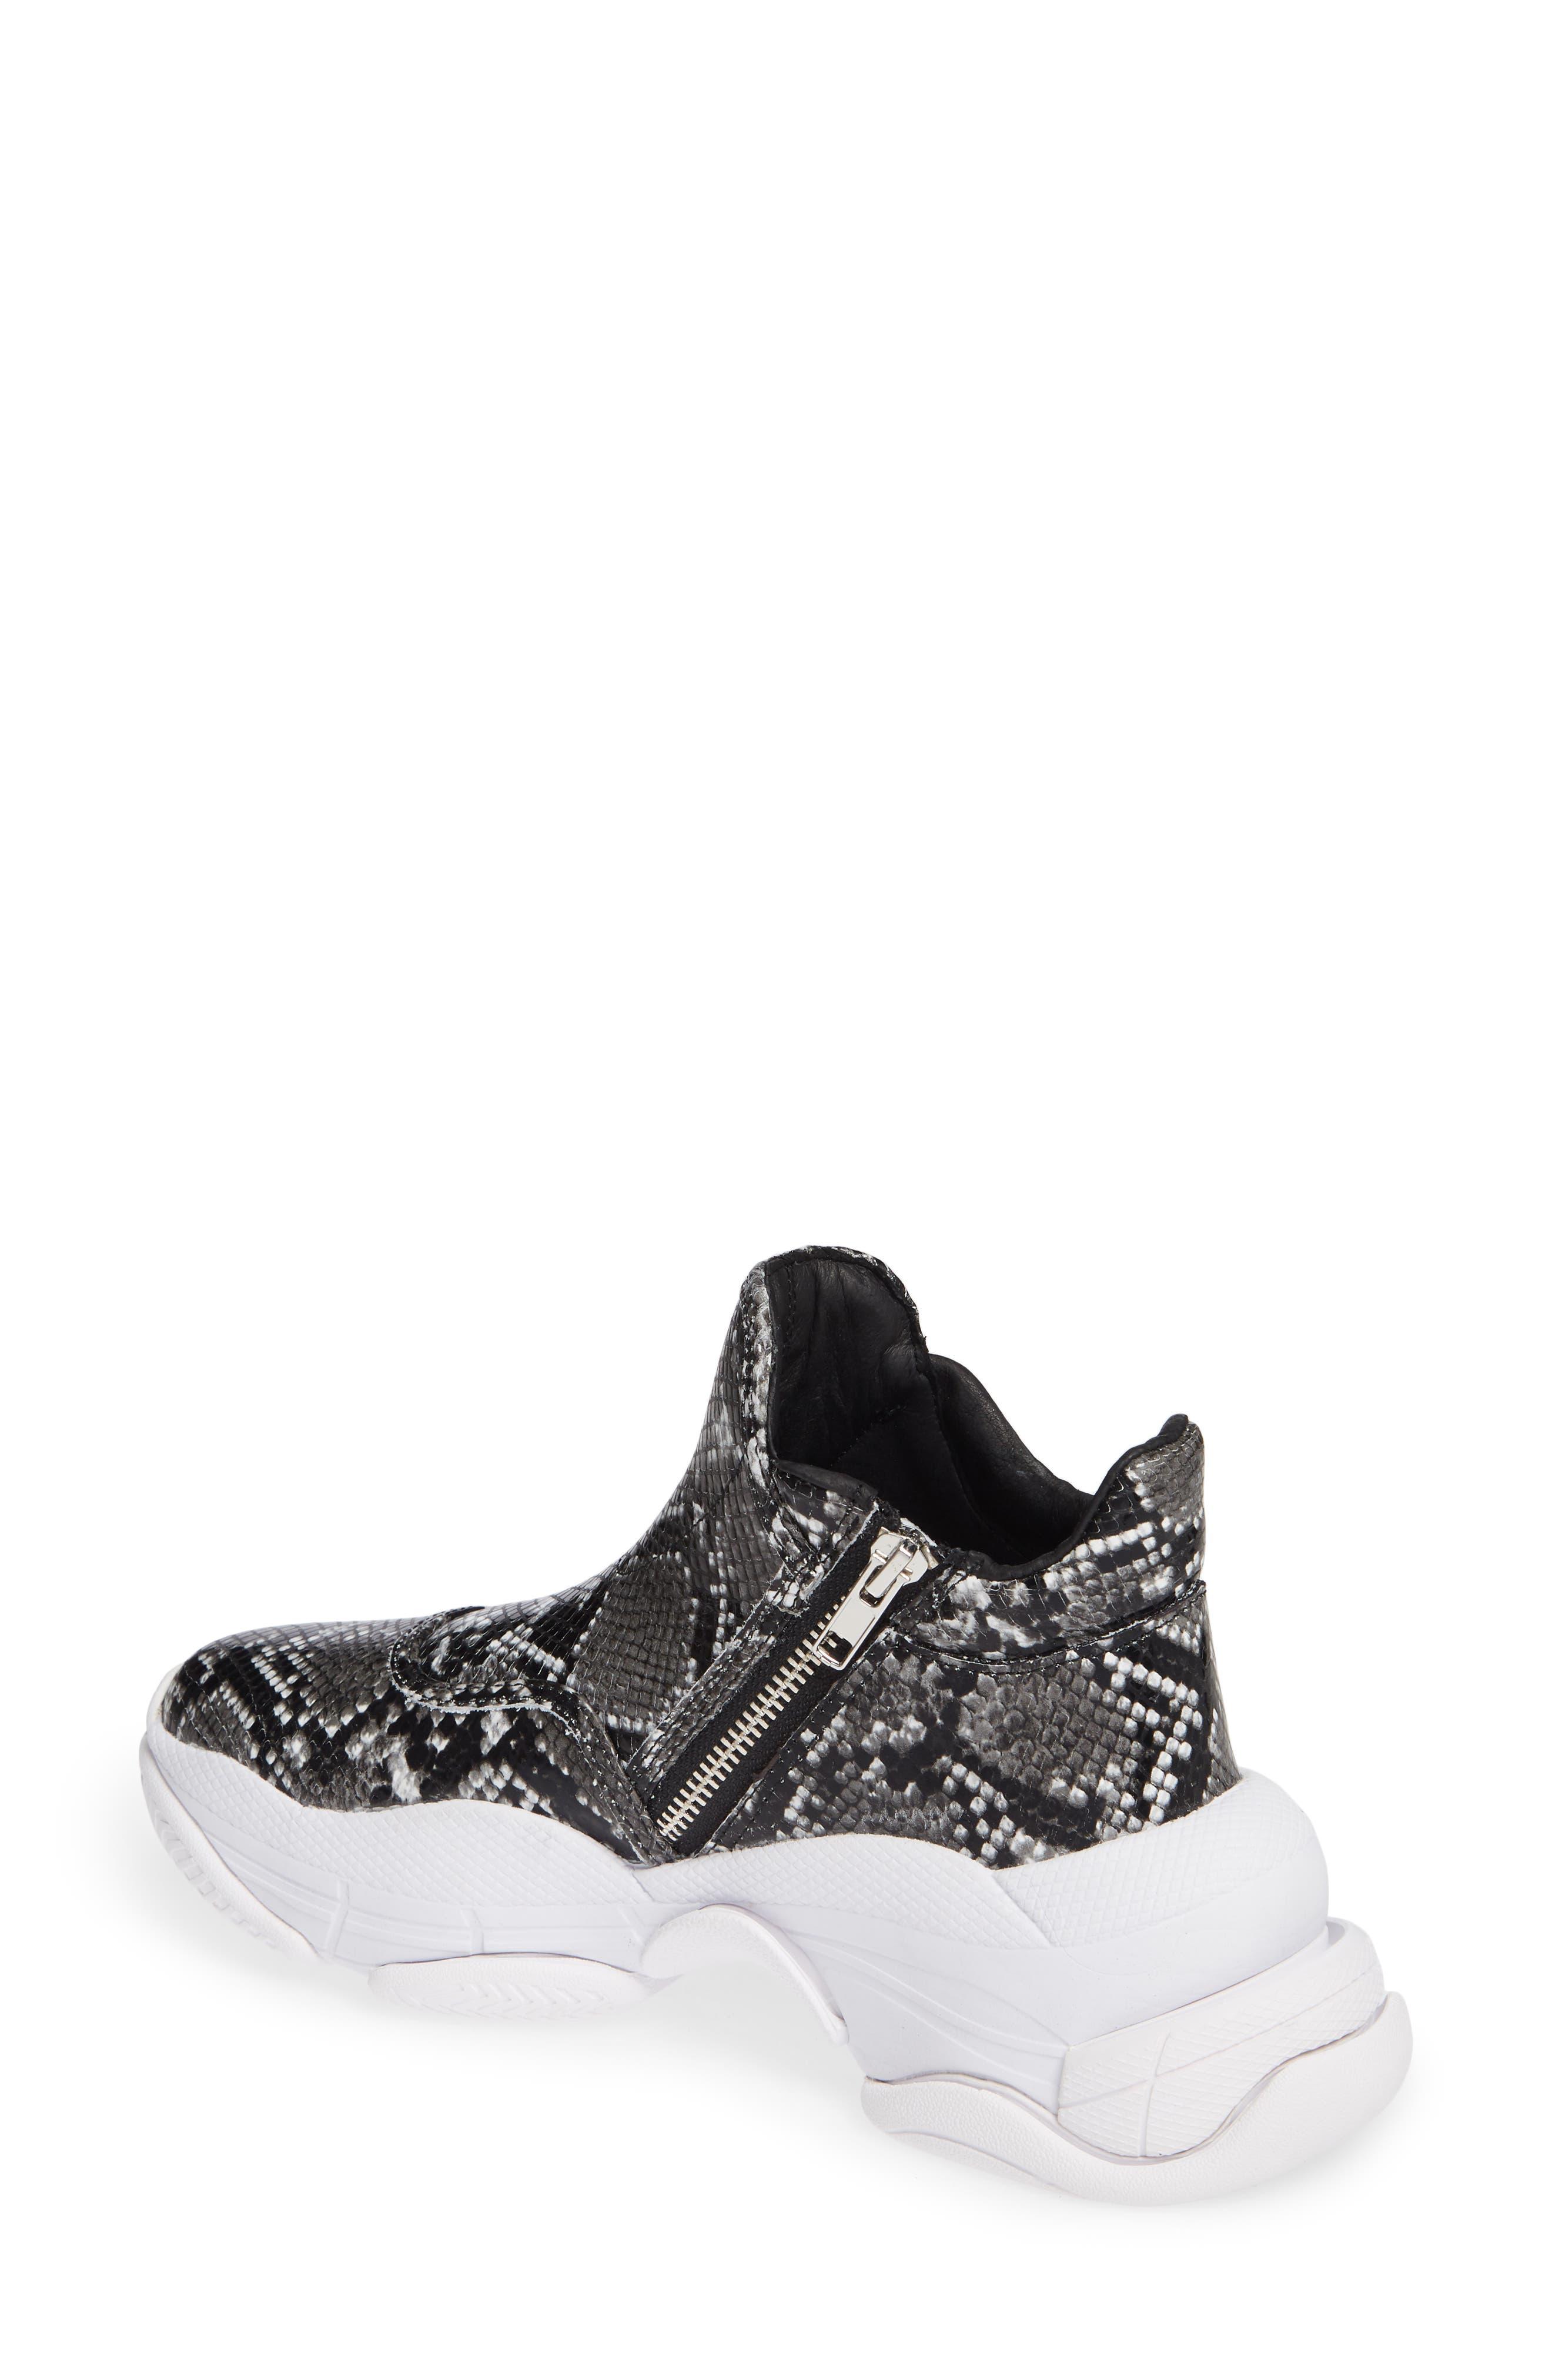 CTRL-DEL Sneaker,                             Alternate thumbnail 2, color,                             GREY BLACK SNAKE